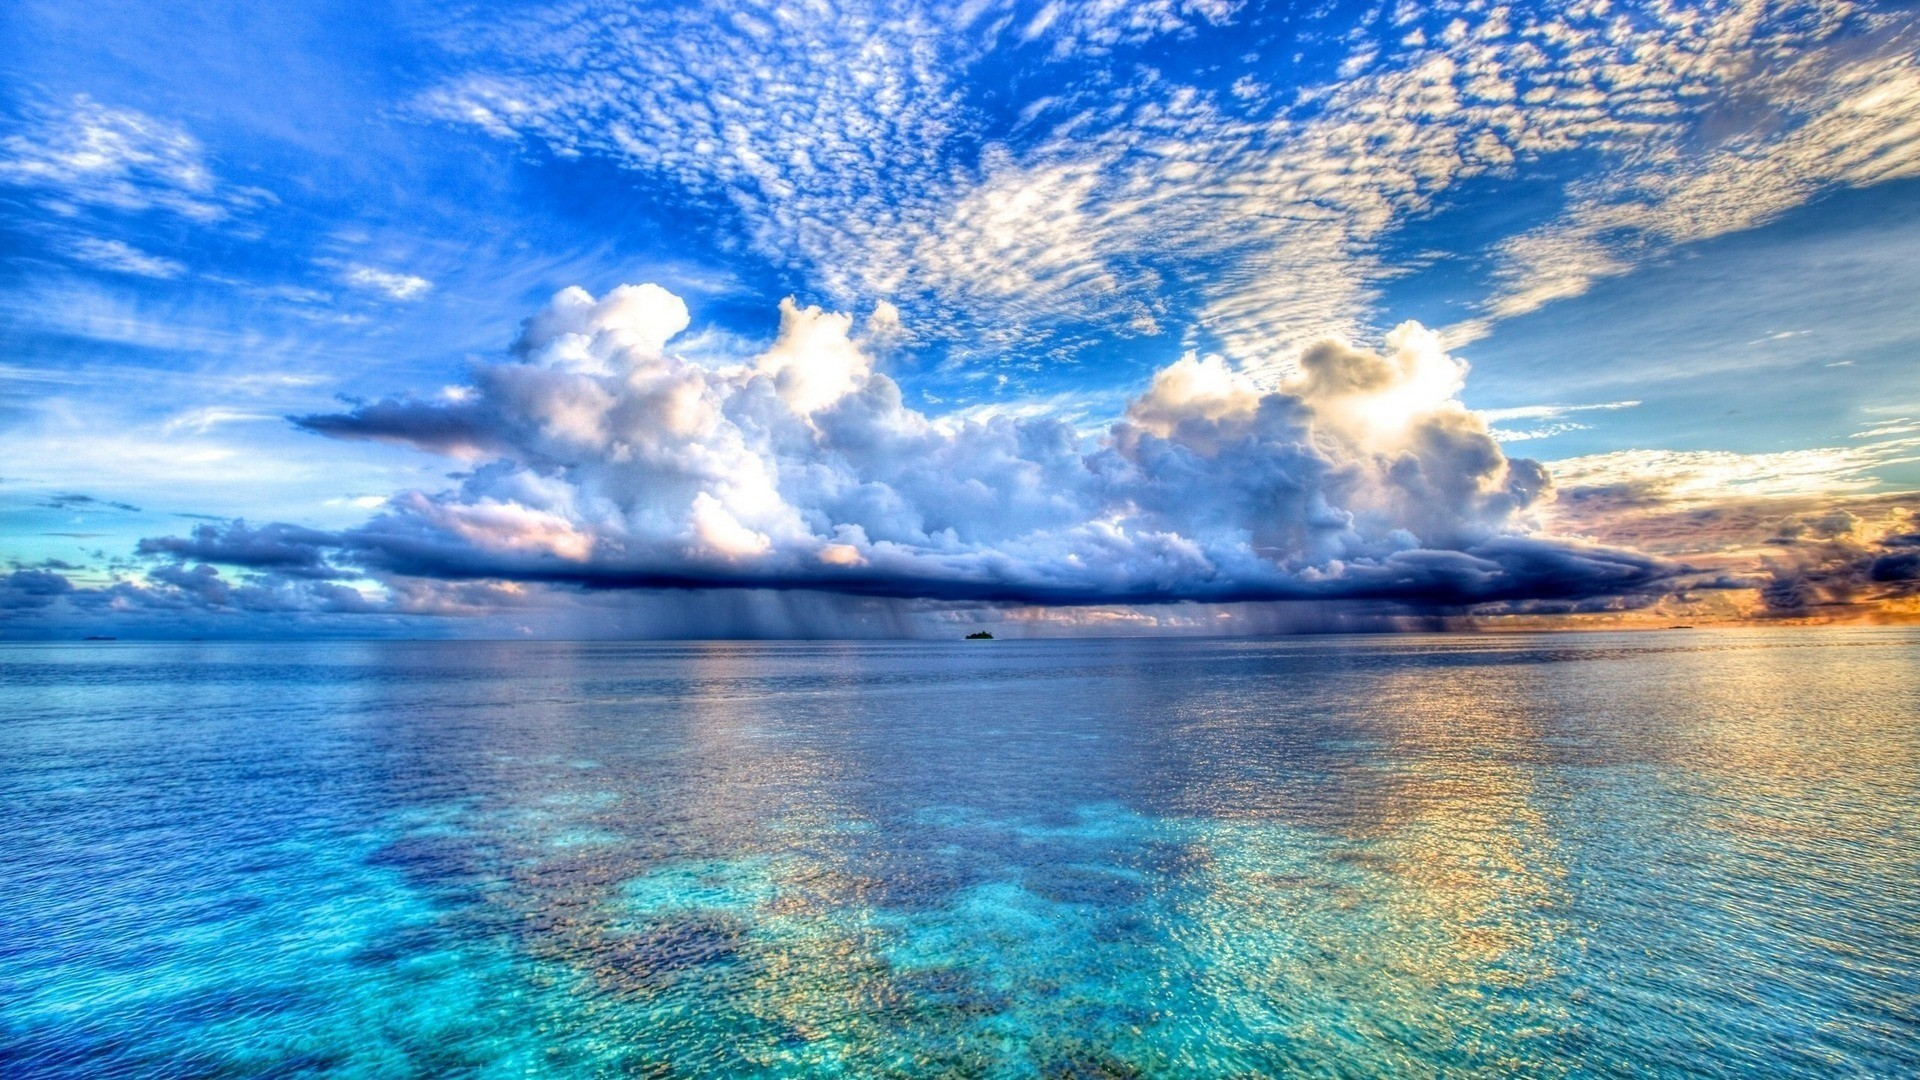 natural ocean wallpaper. best hd ocean wallpaper